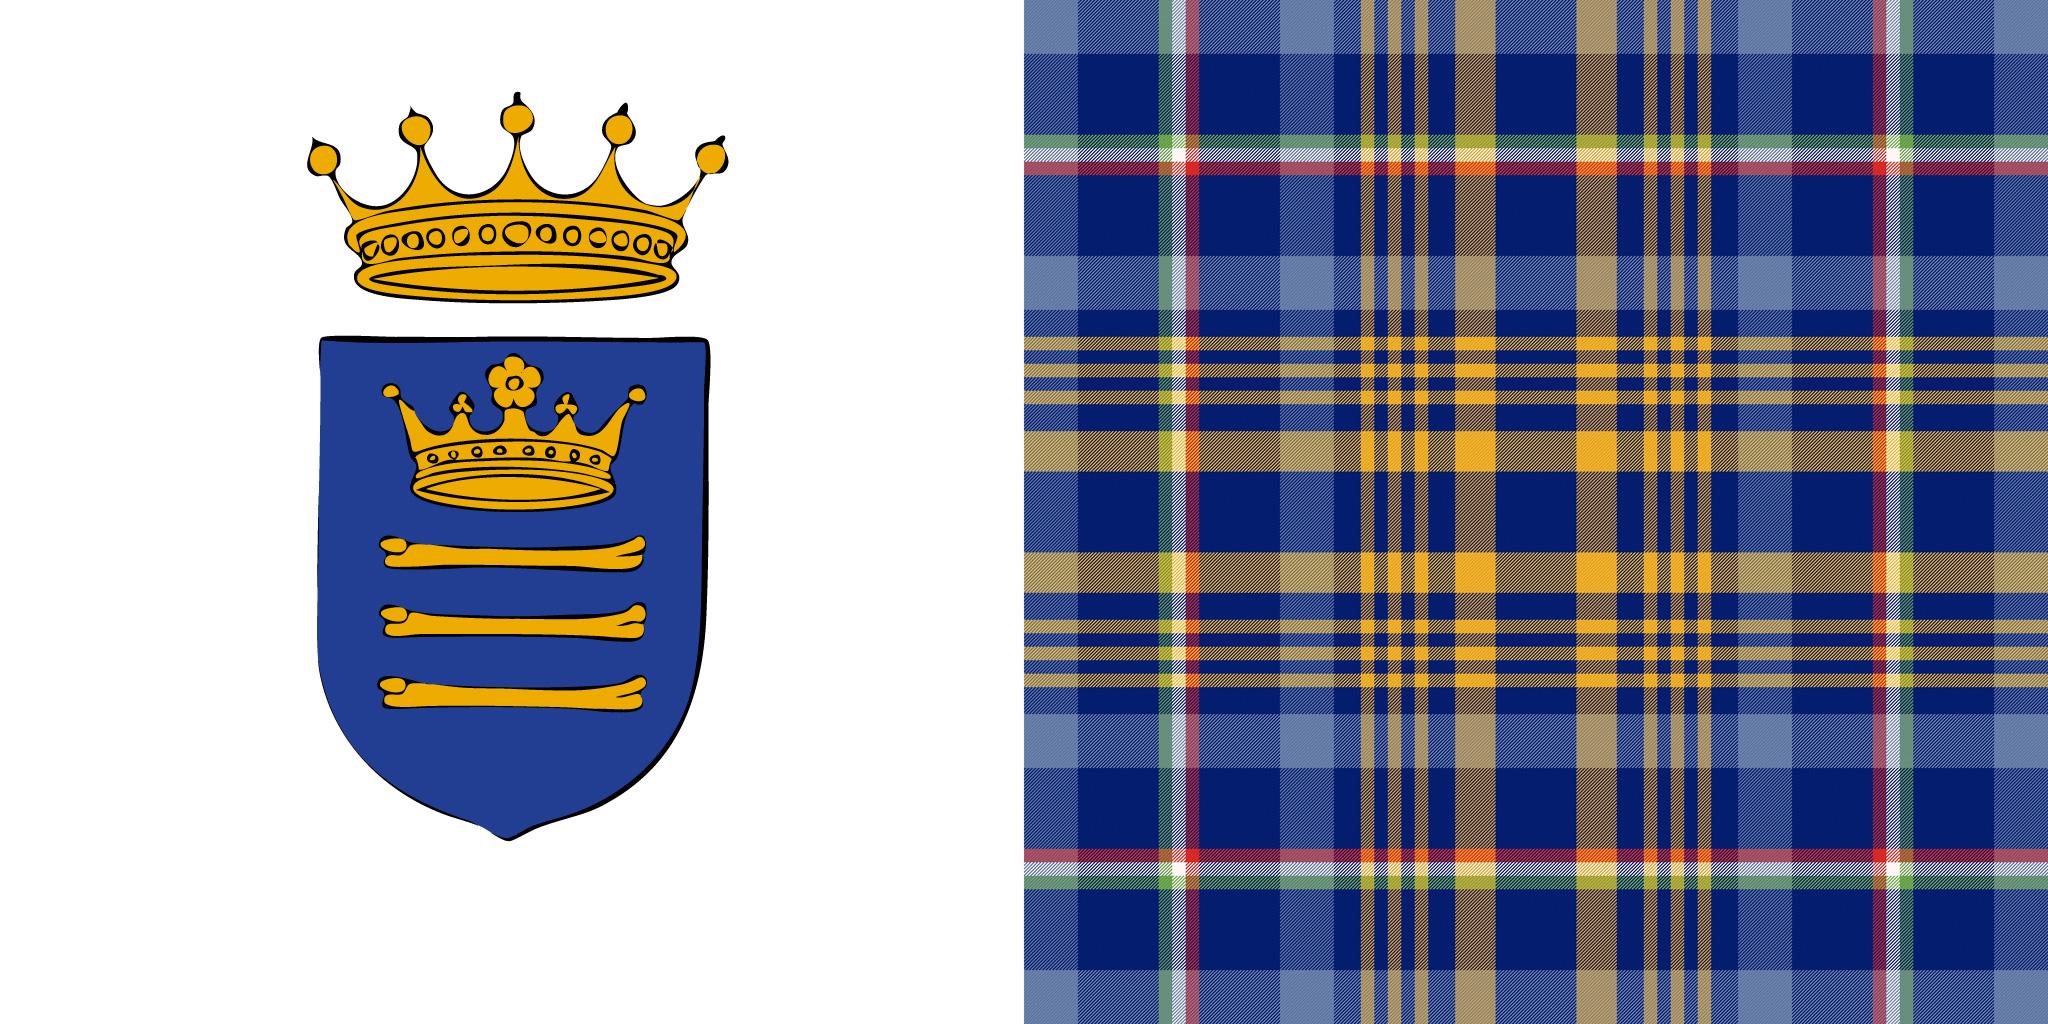 coat-of-arms-vs-tartanjpg